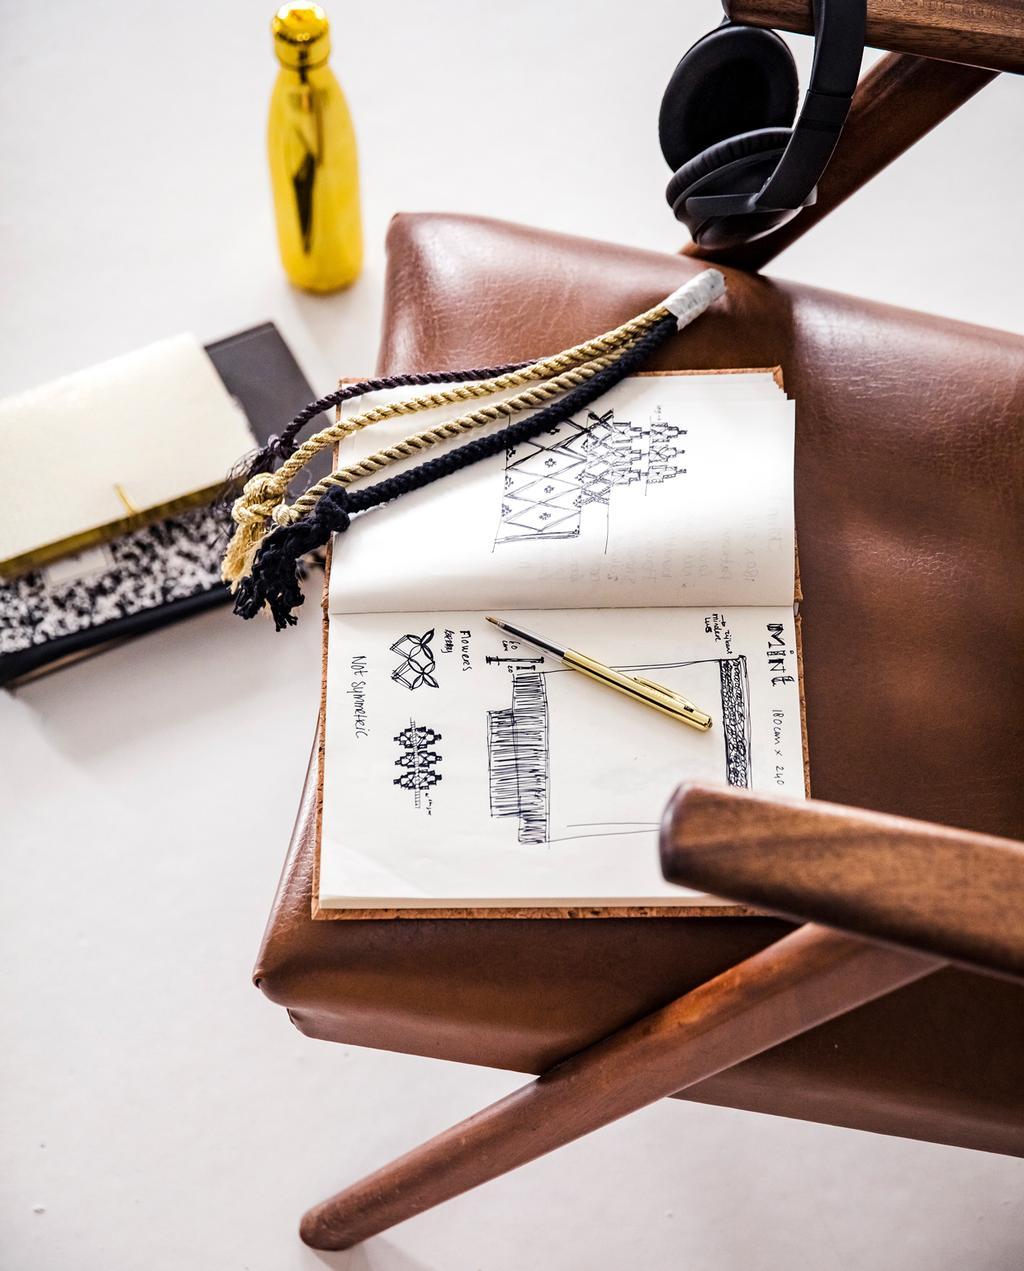 vtwonen 13-2019 | Ambacht Milla bruin lederen stoel ontwerp schets